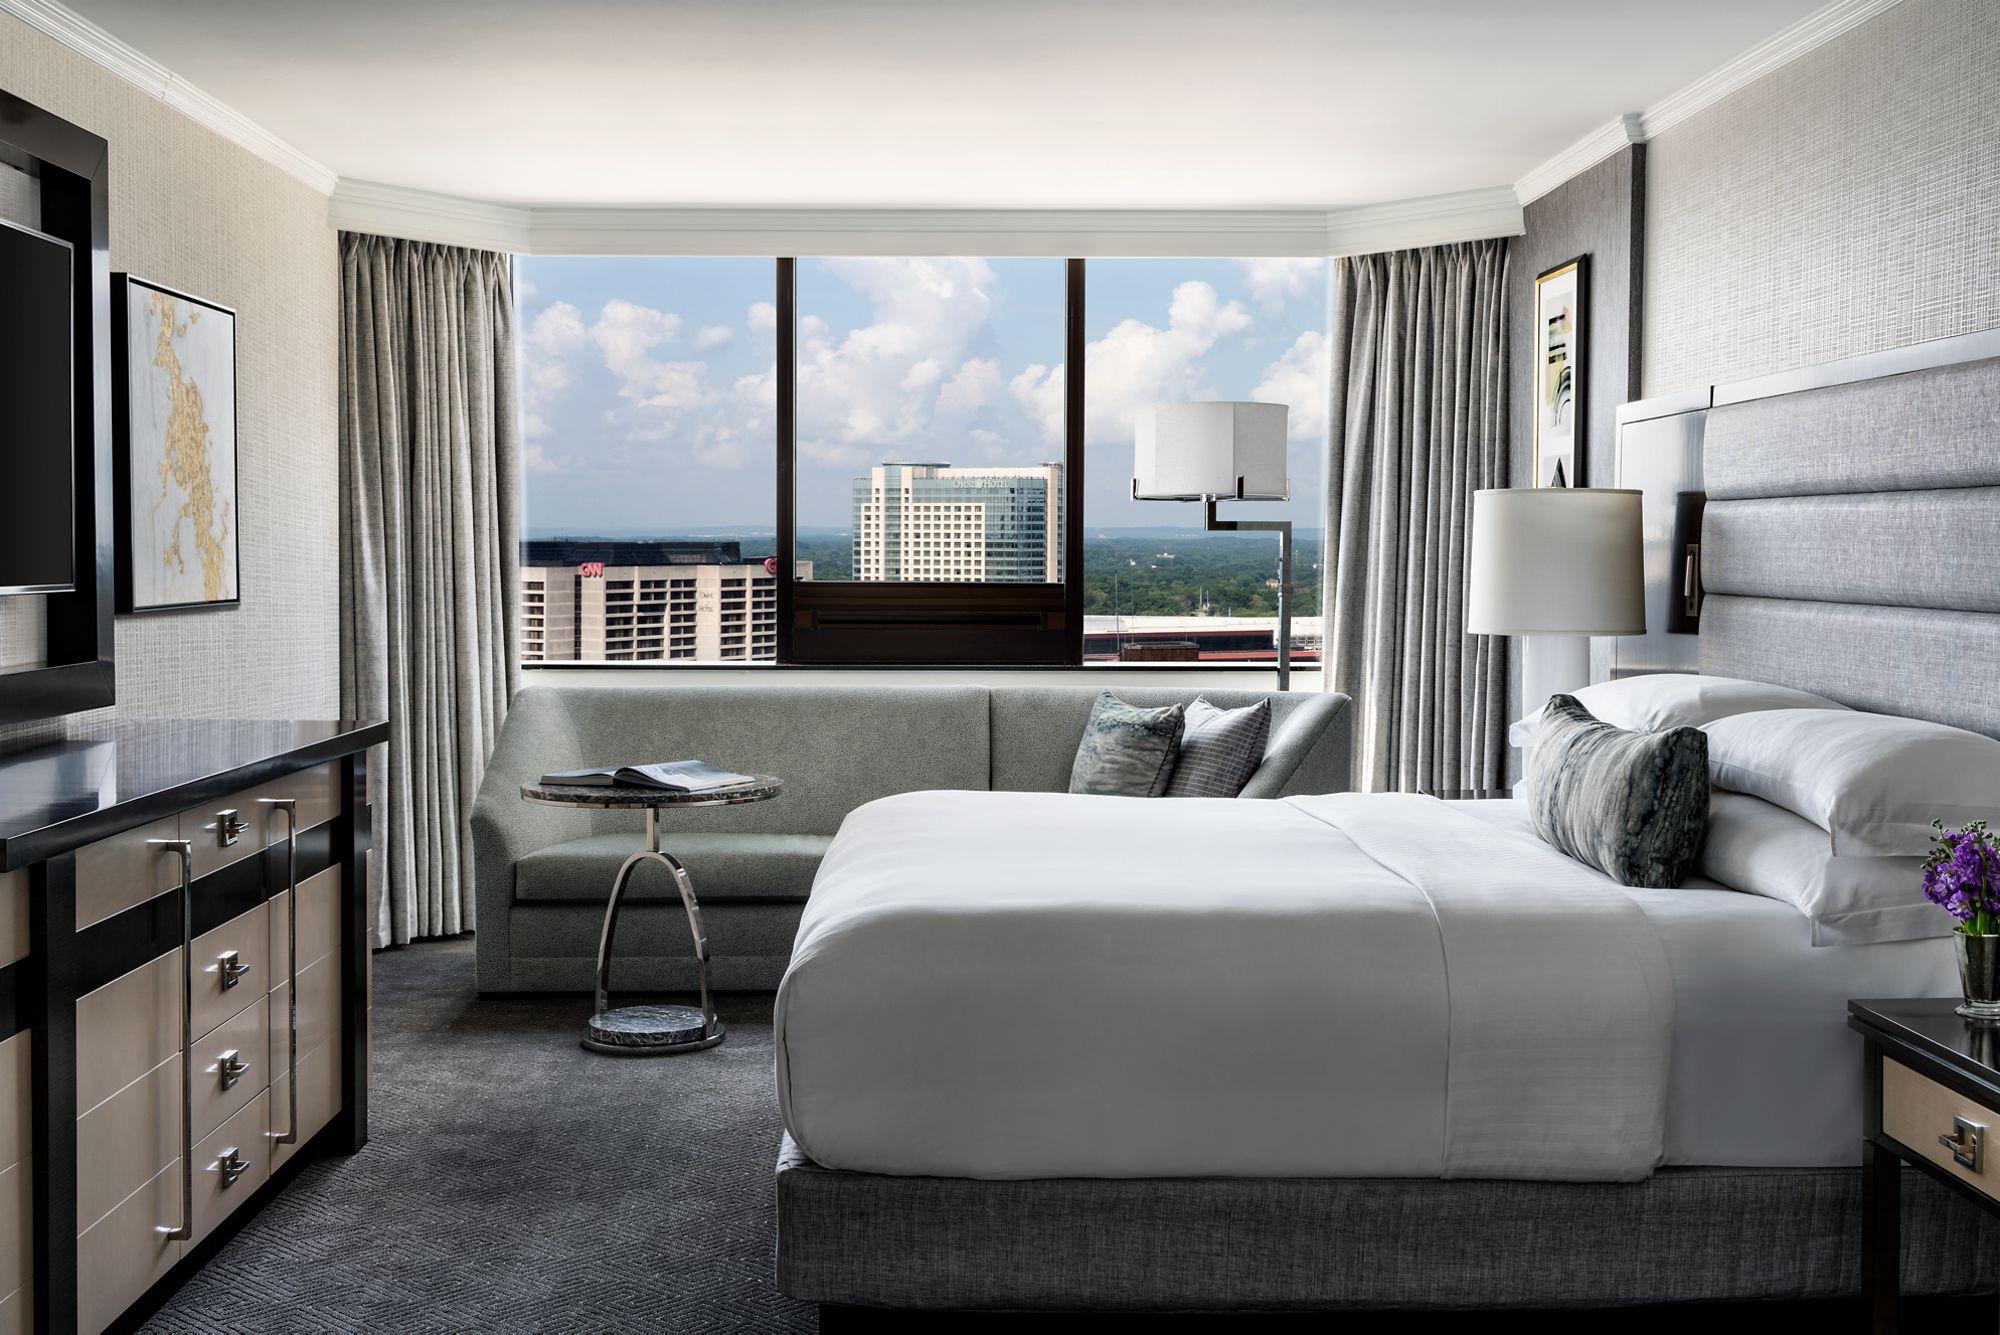 Presidential Suite In Atlanta Georgia The Ritz Carlton Atlanta